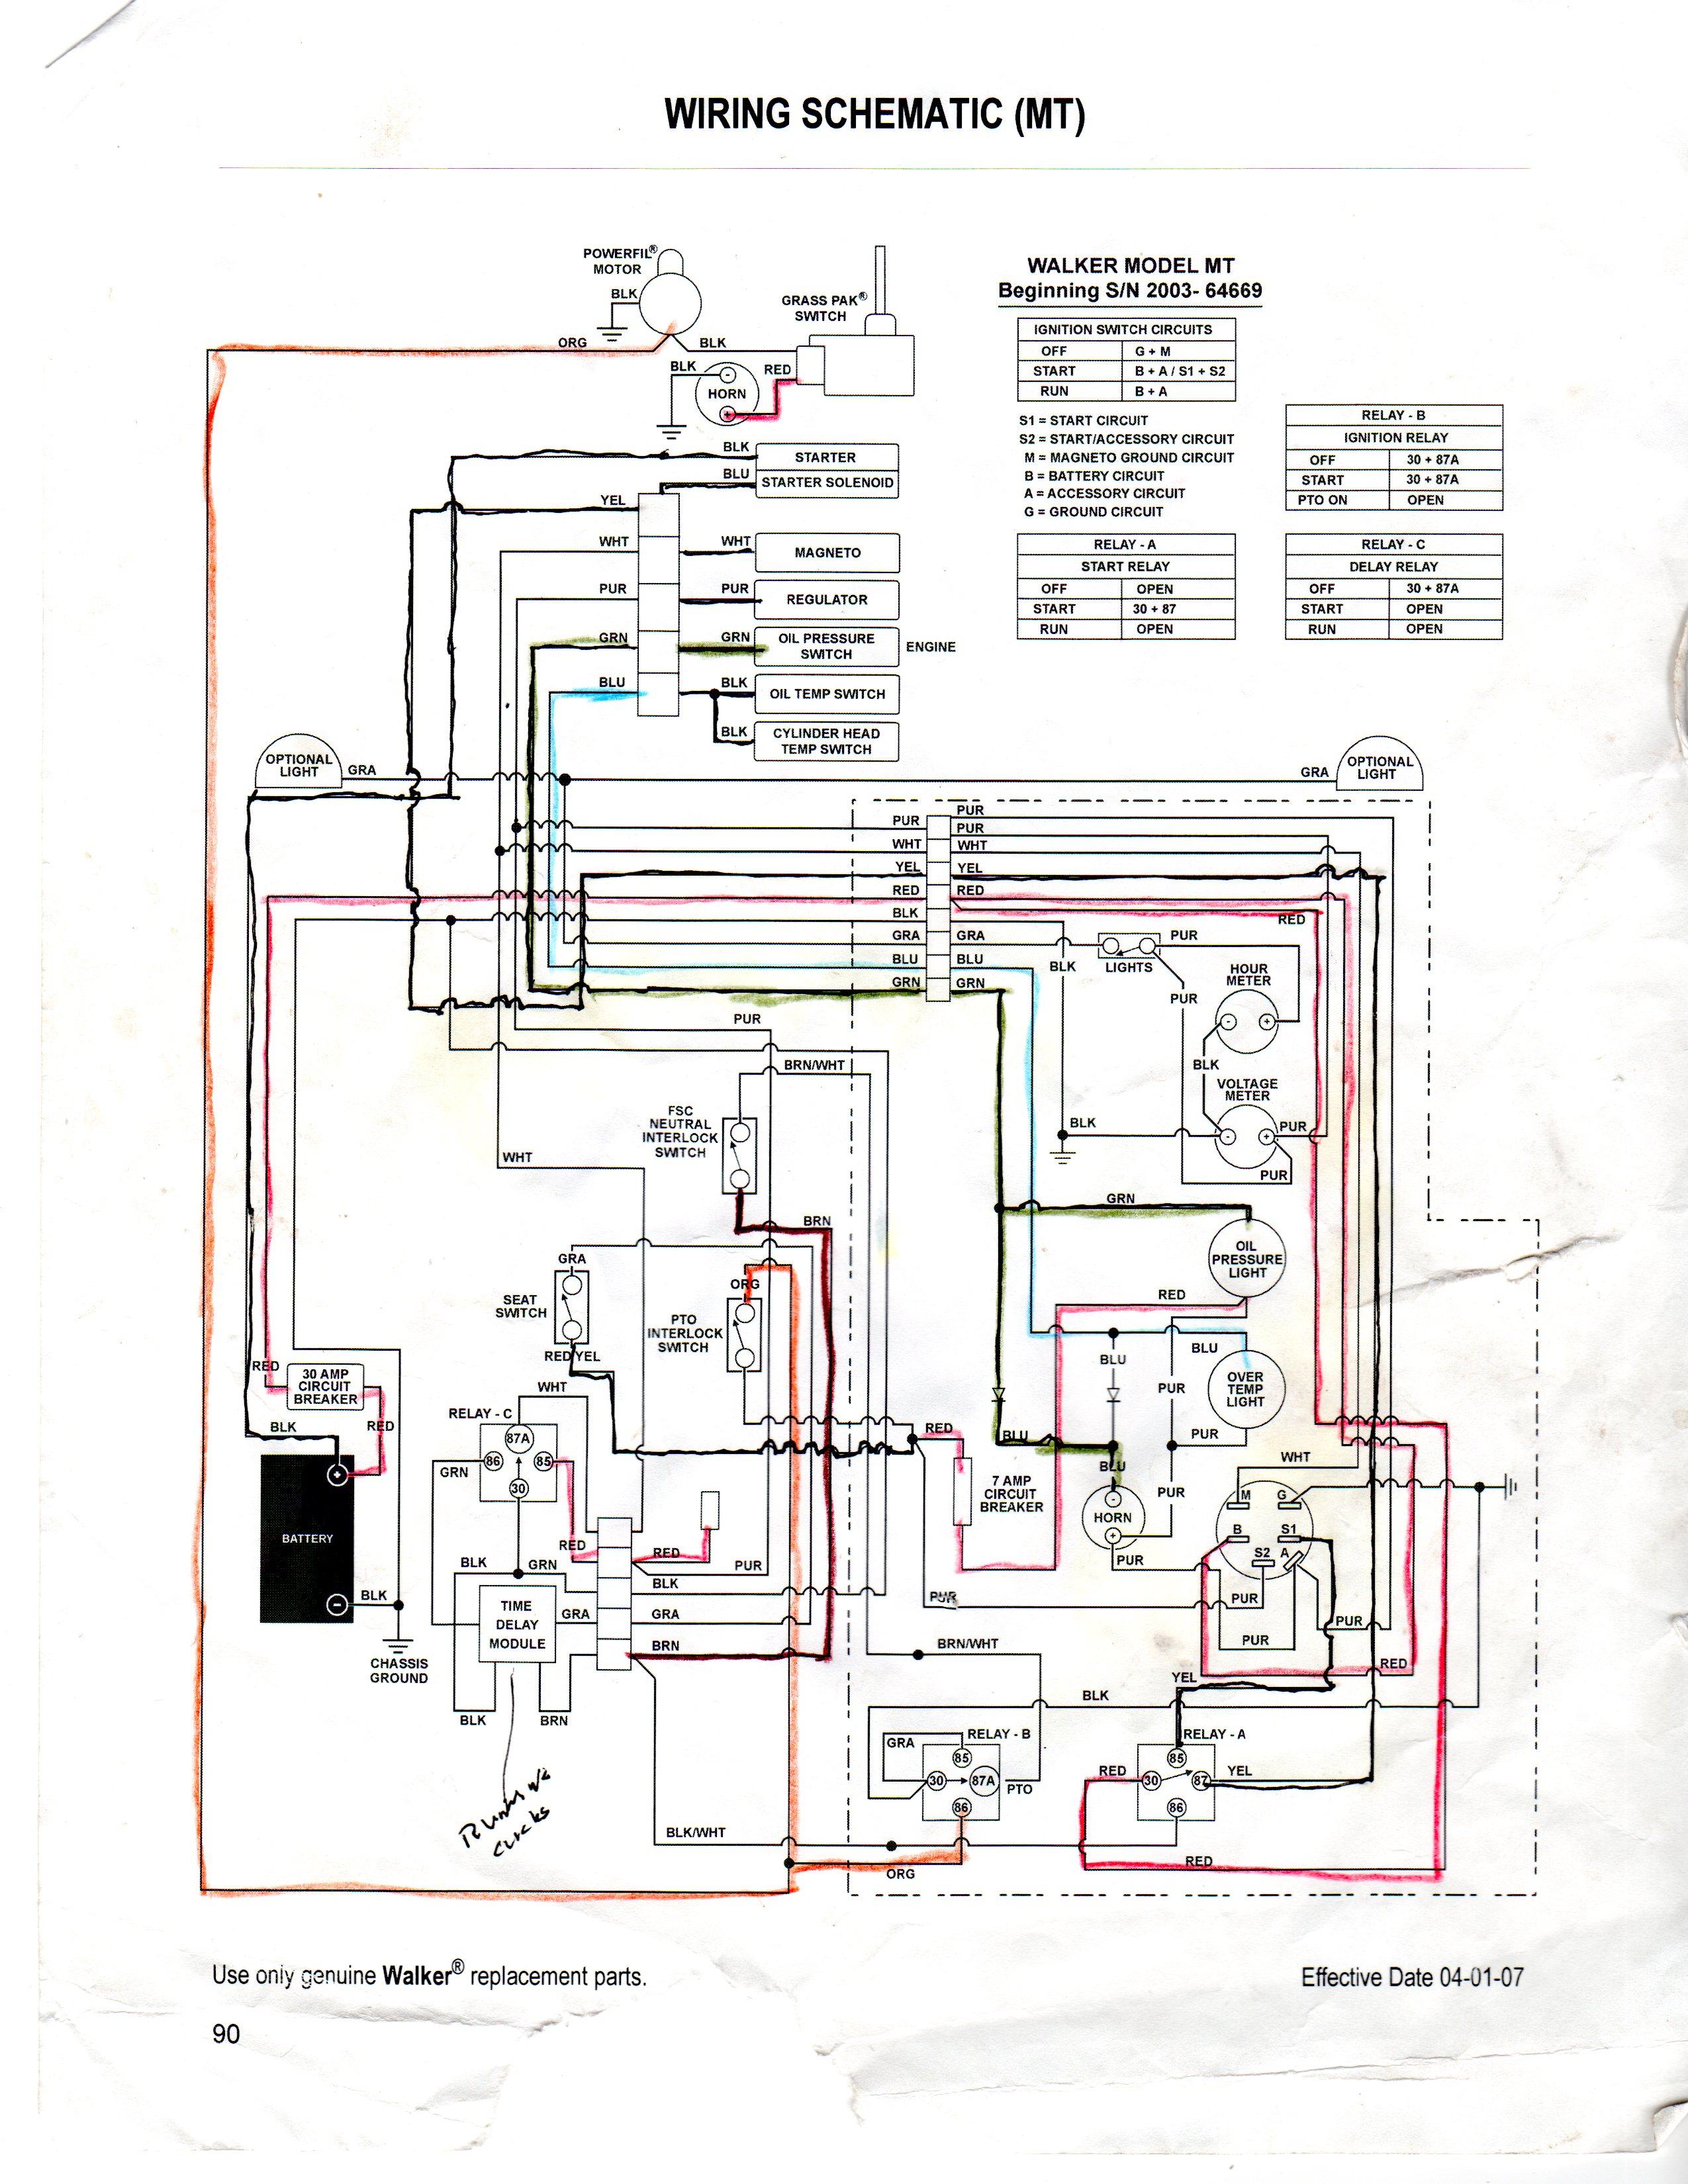 [DIAGRAM_5UK]  5915A59 Wiring Diagram For Cub Cadet Ltx 1046 | Wiring Diagram | Wiring  Library | Cub Cadet Ltx 1042 Wiring Diagram |  | Wiring Library